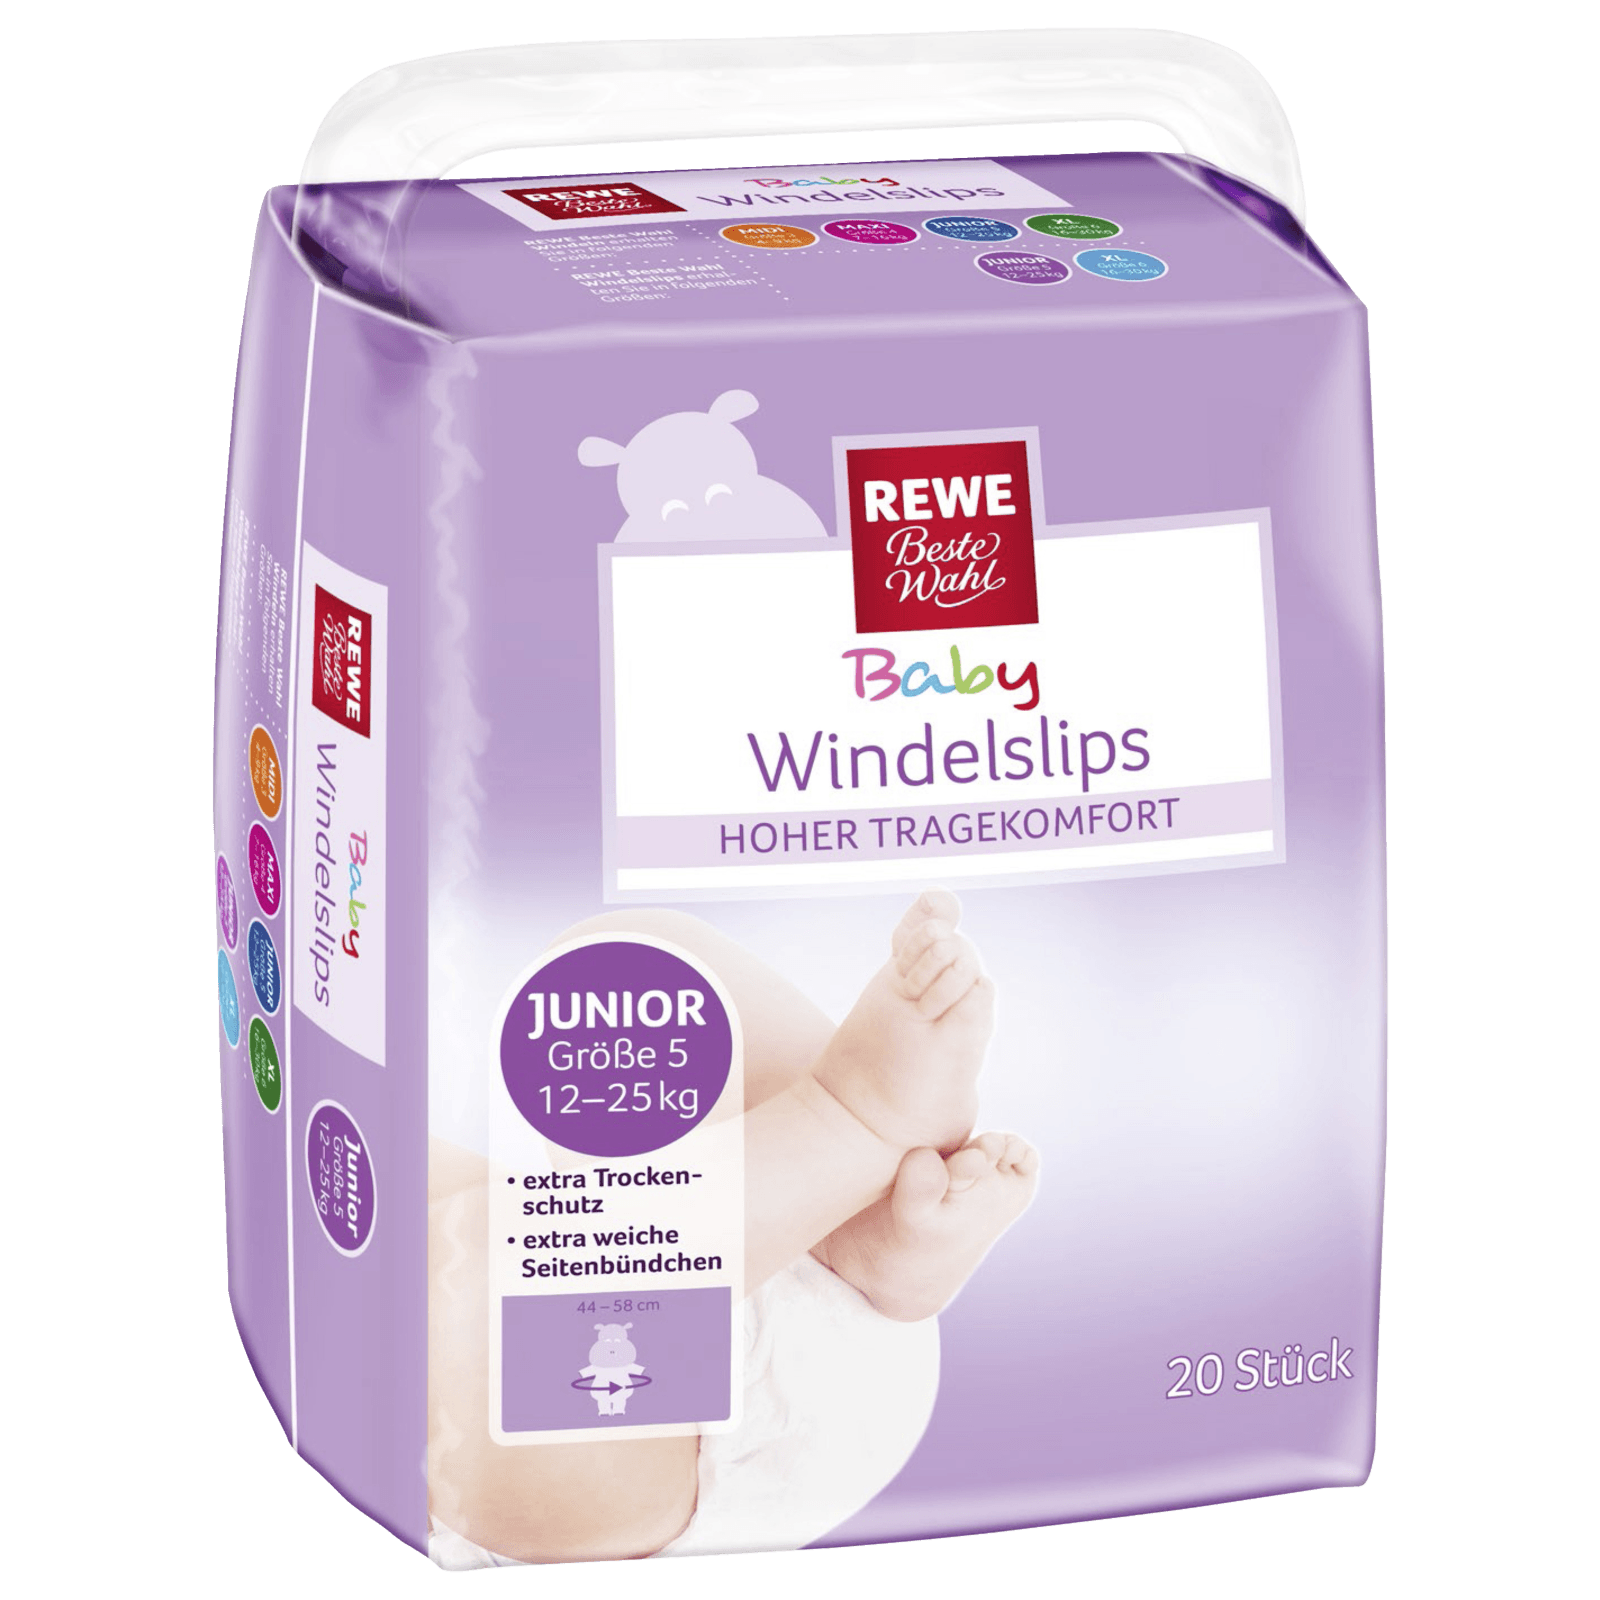 REWE Beste Wahl Windelslips Junior Gr. 5 12-25kg 20 Stück